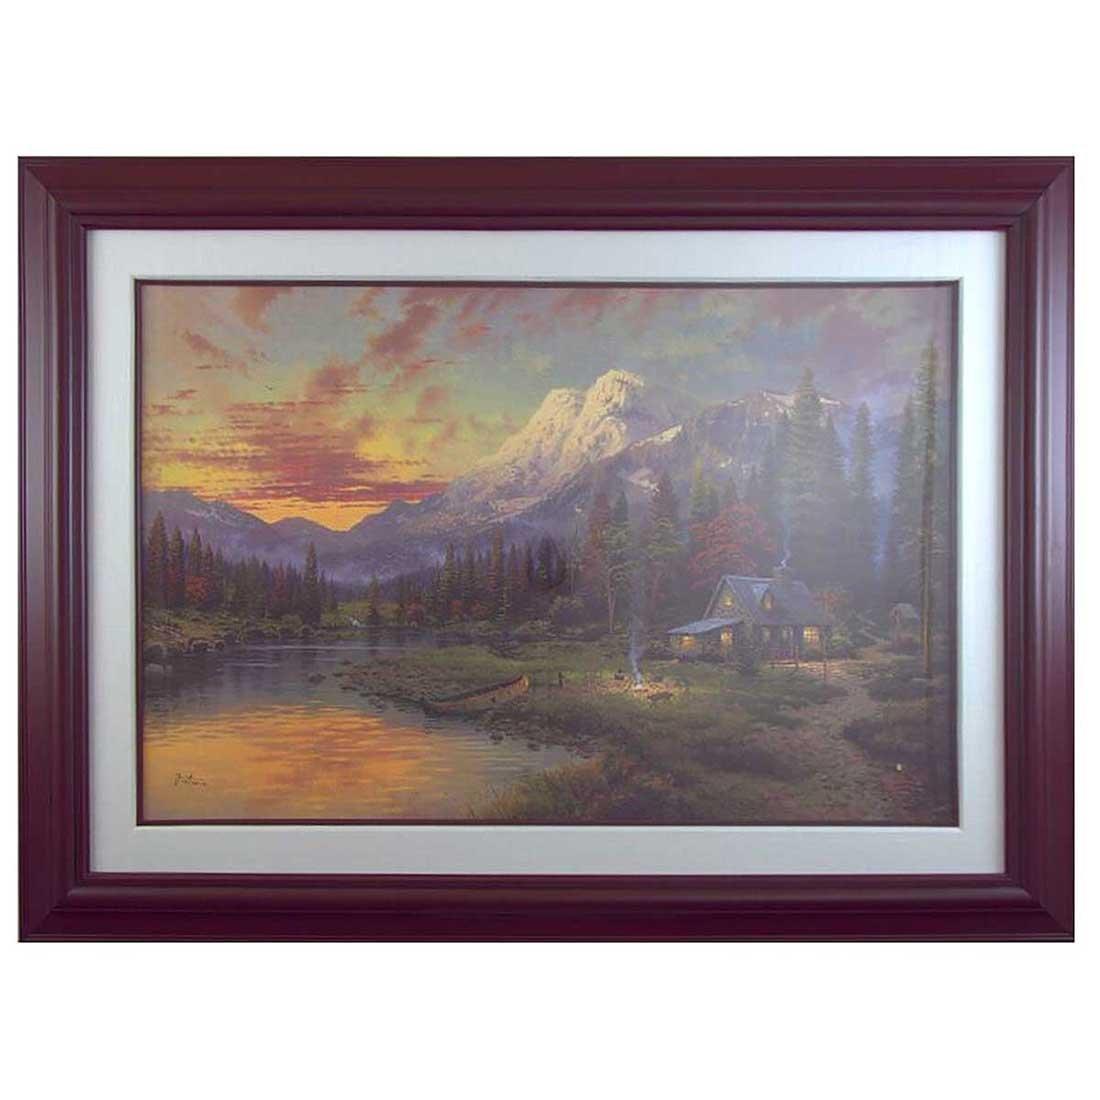 Thomas Kinkade - Sierra Evening Majesty - 2